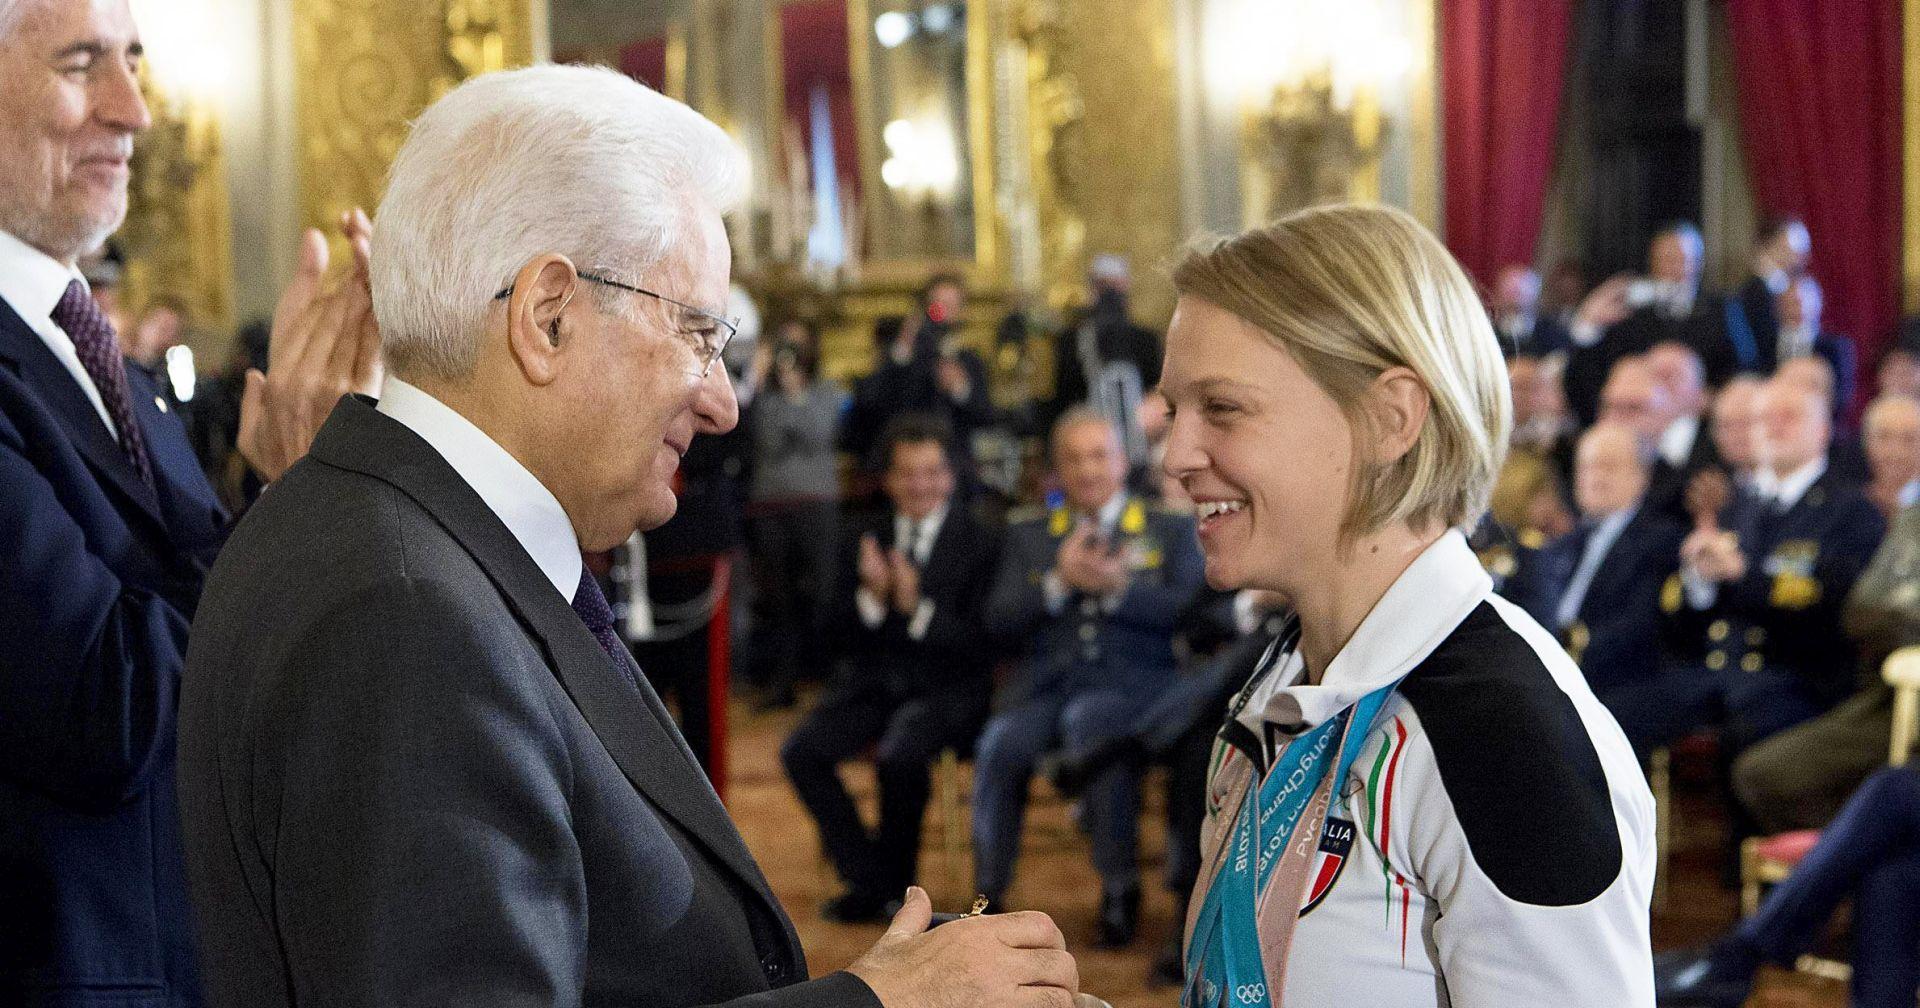 Talijanski predsjednik počinje konzultacije o formiranju vlade